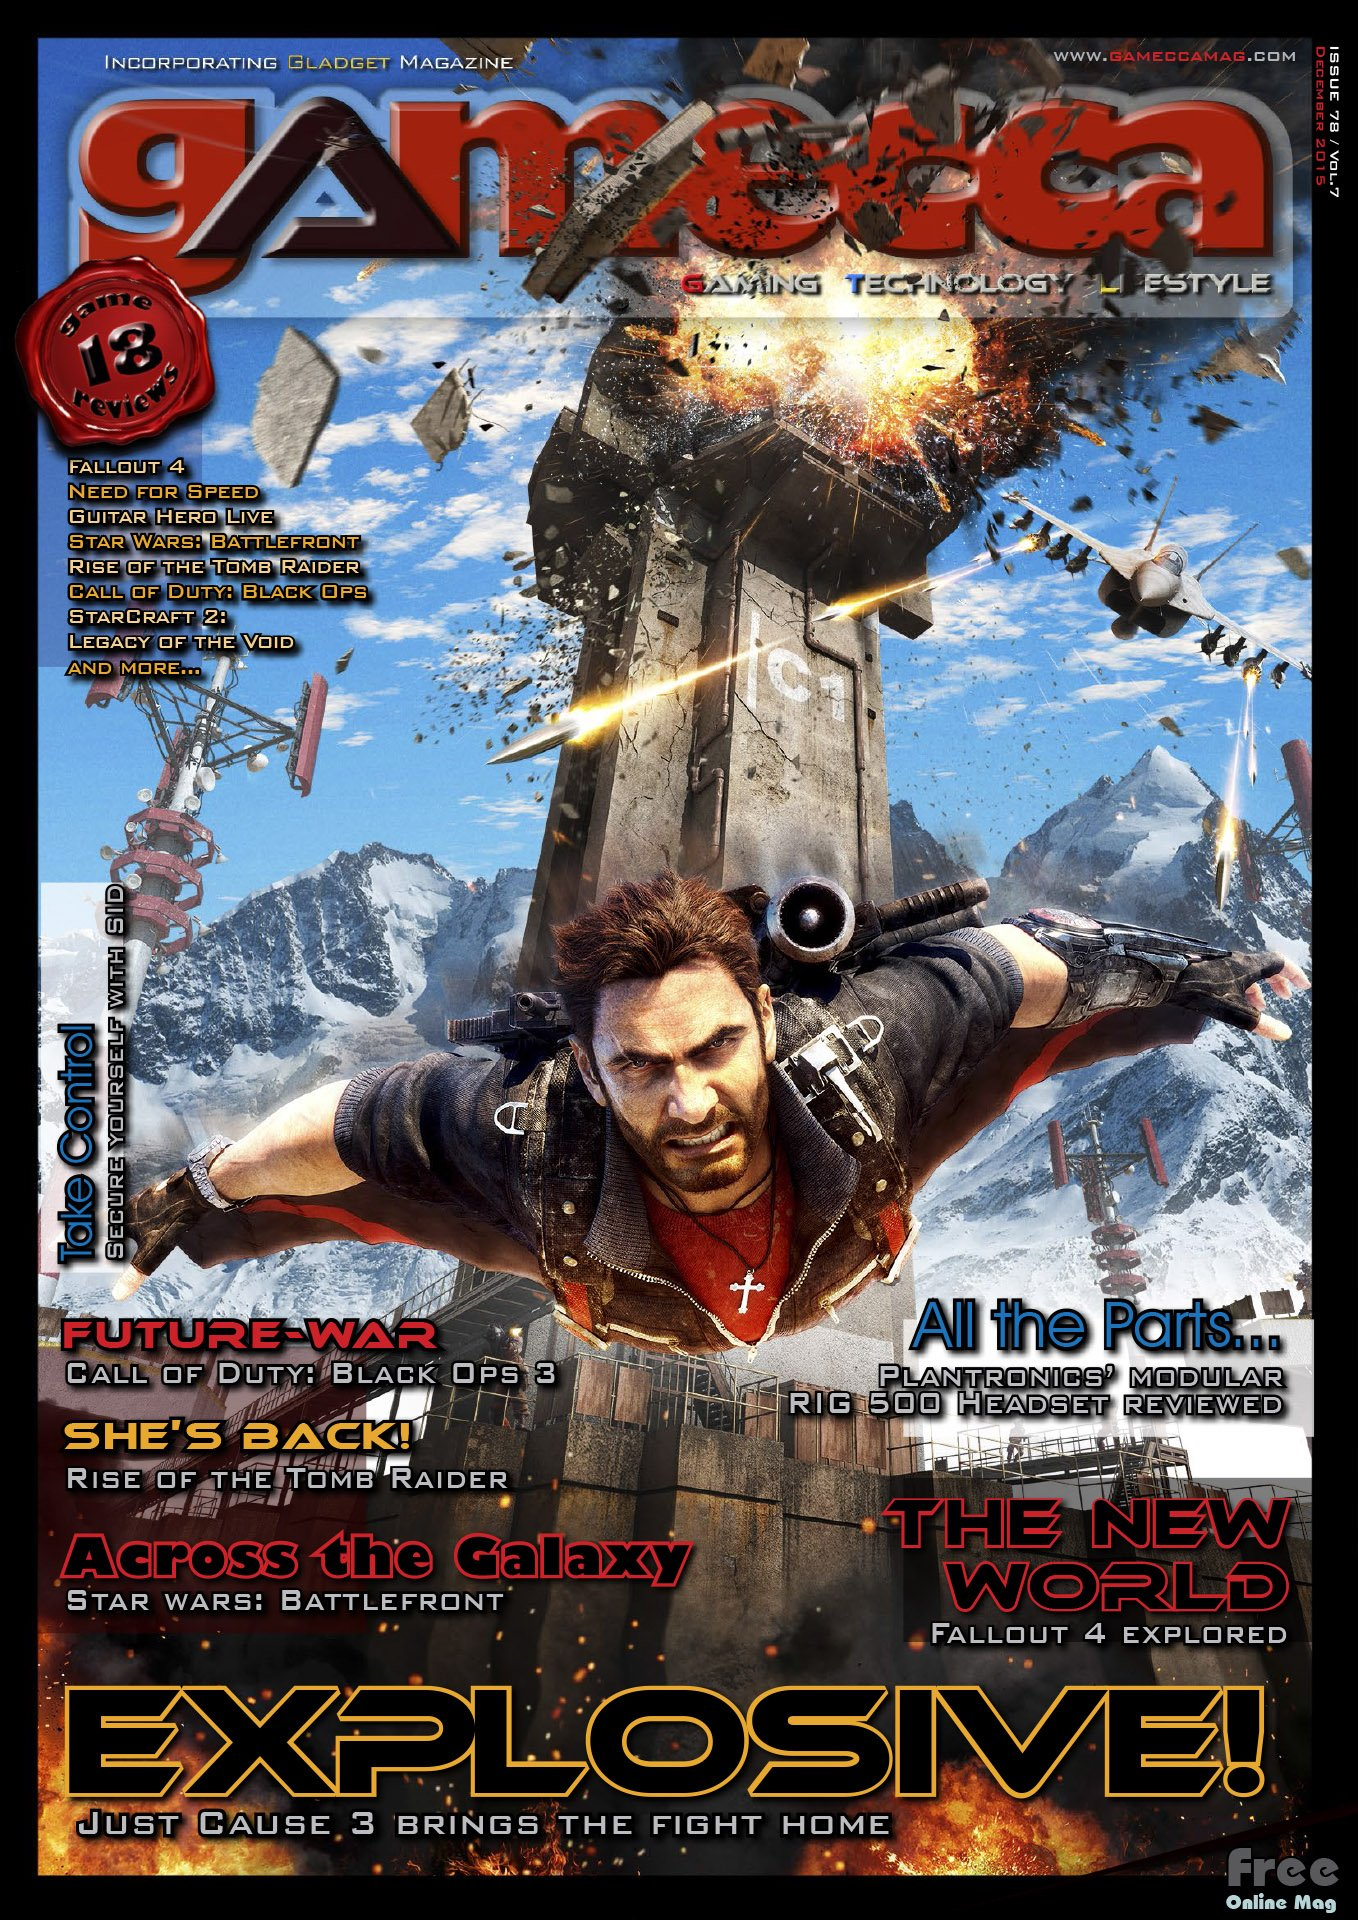 Gamecca 078 (December 2015)